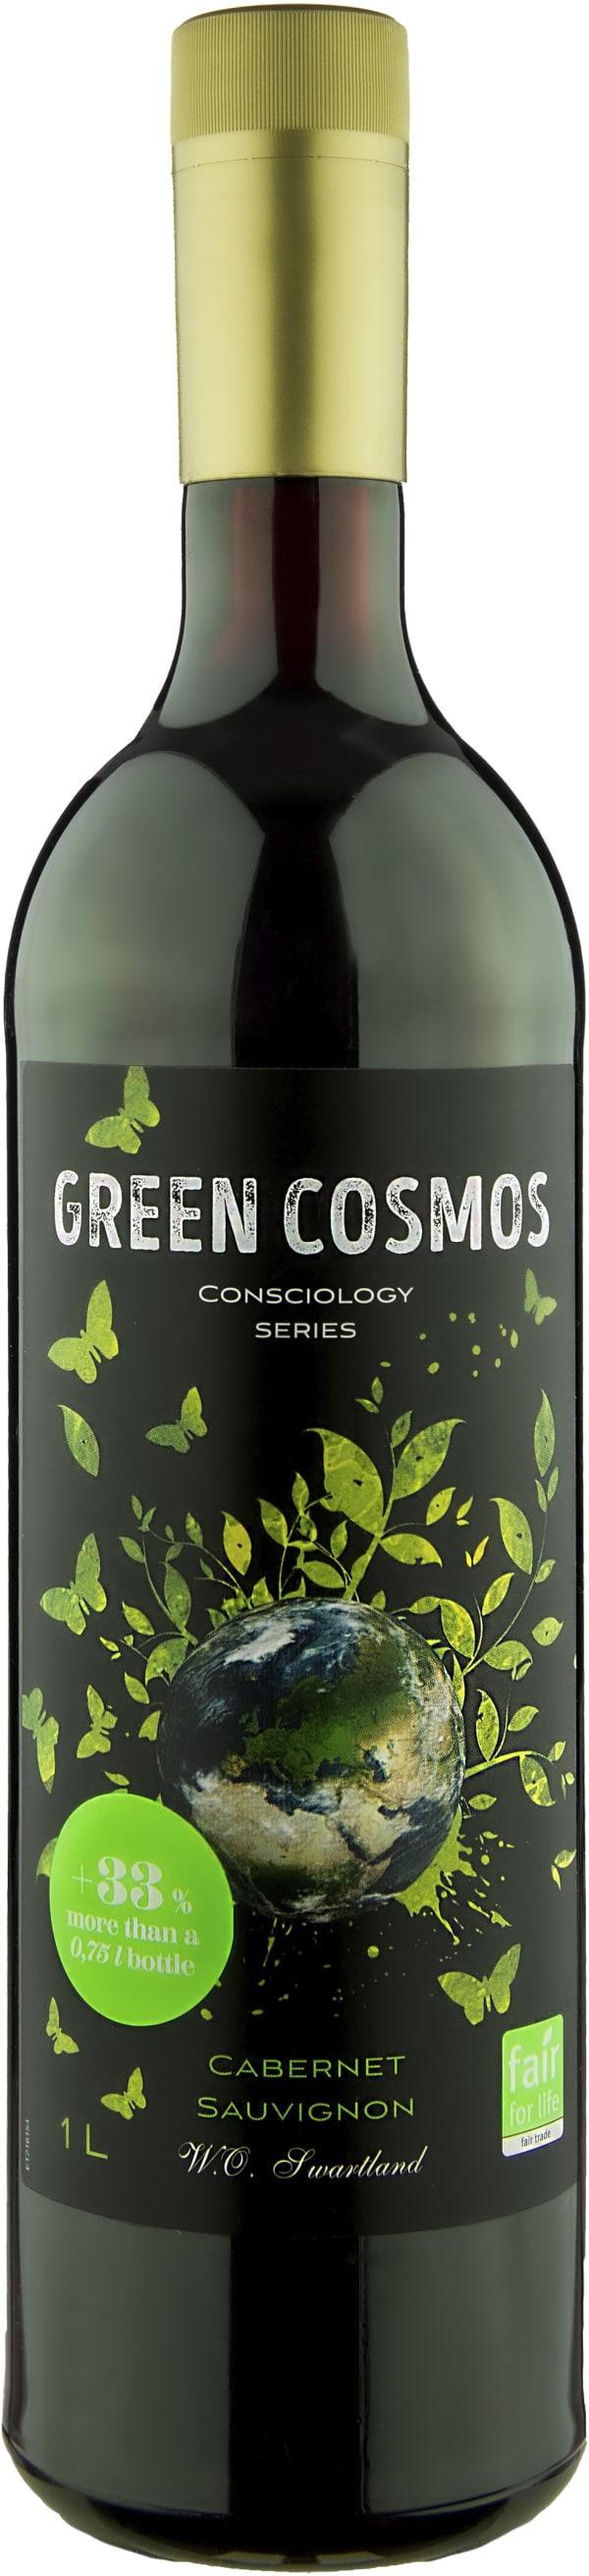 Consciology Cabernet Sauvignon 2017 plastflaska